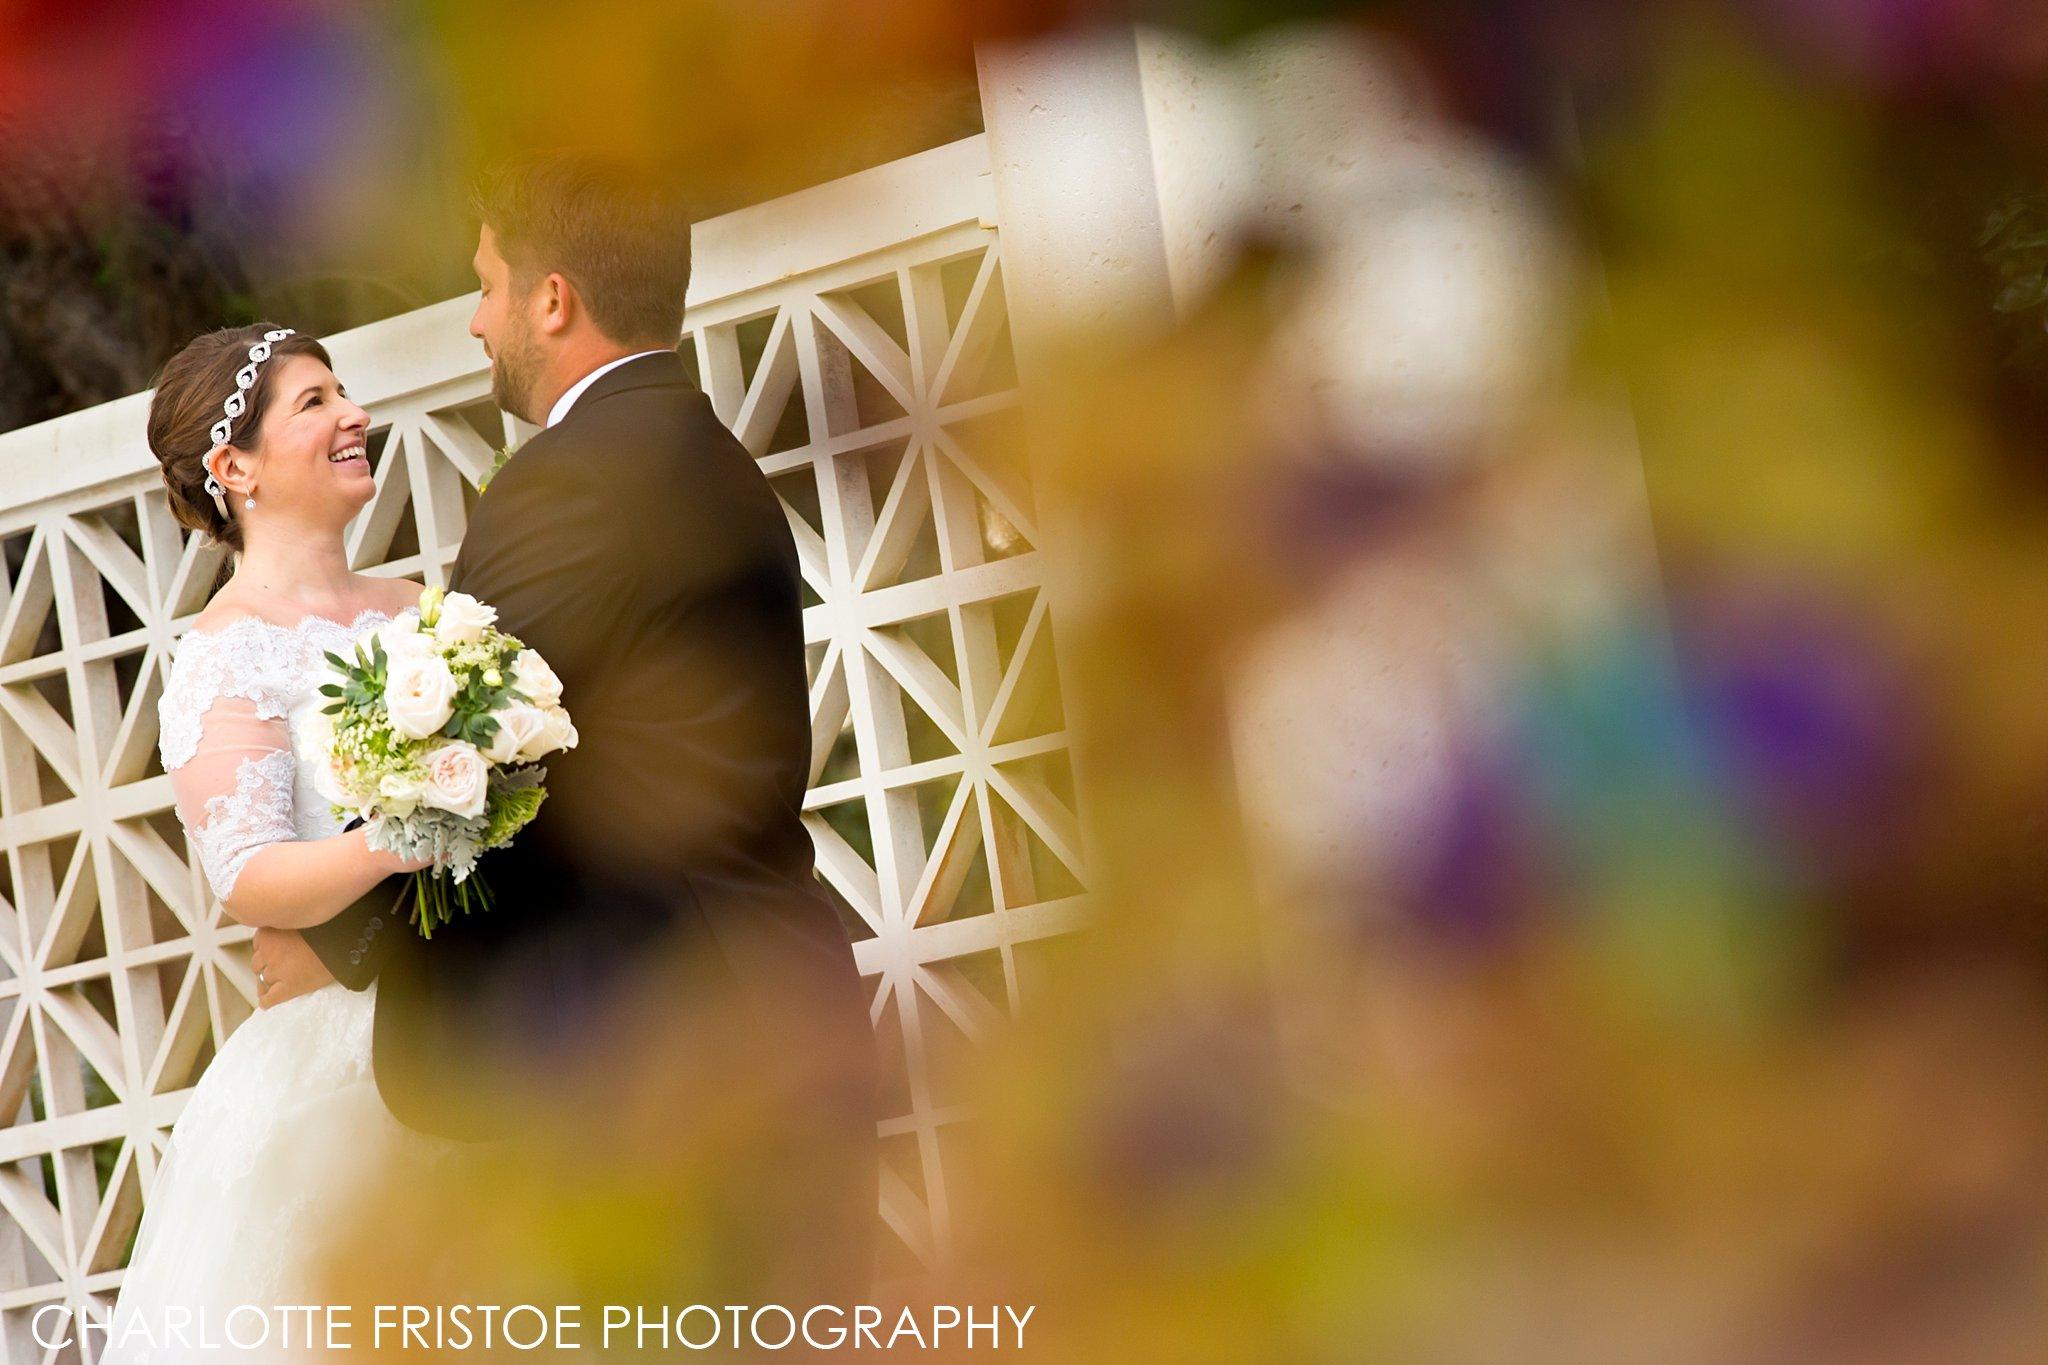 Charlotte Fristoe Photography Blog-40.jpg